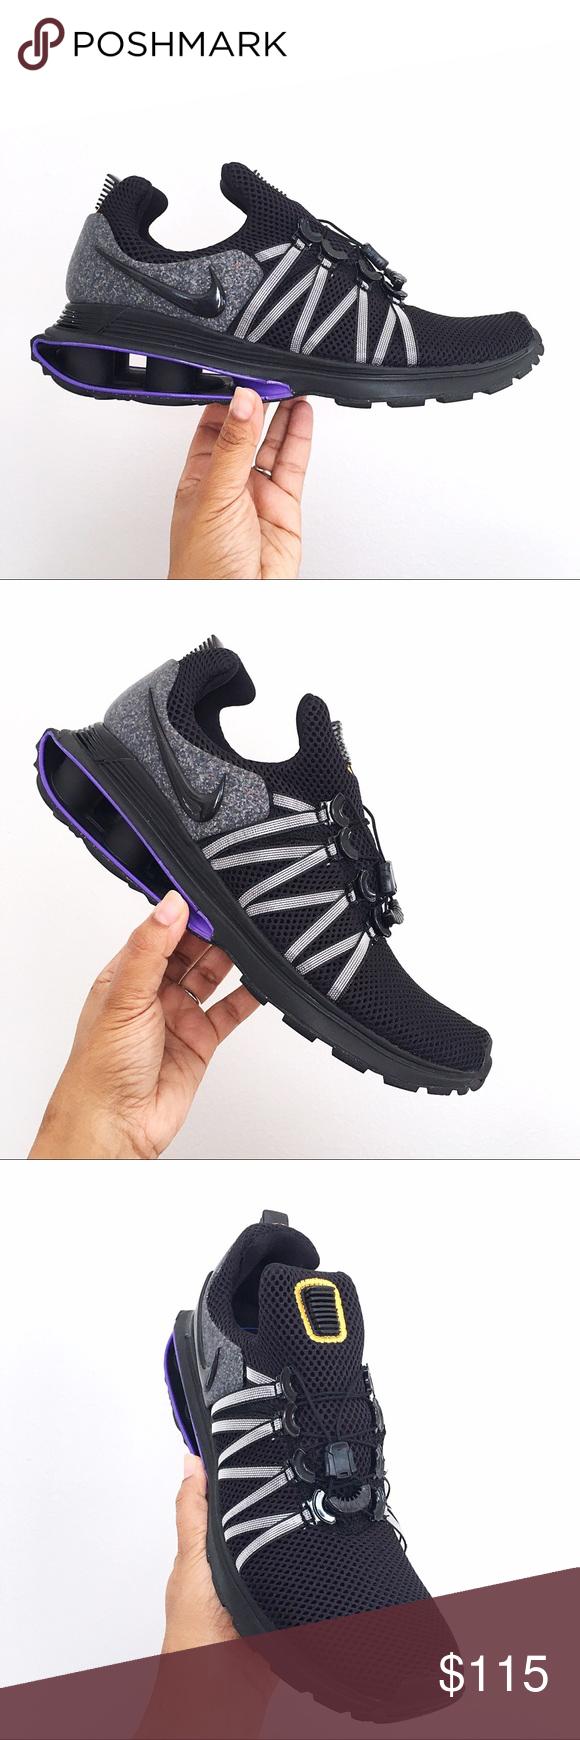 nike shox gravity purple